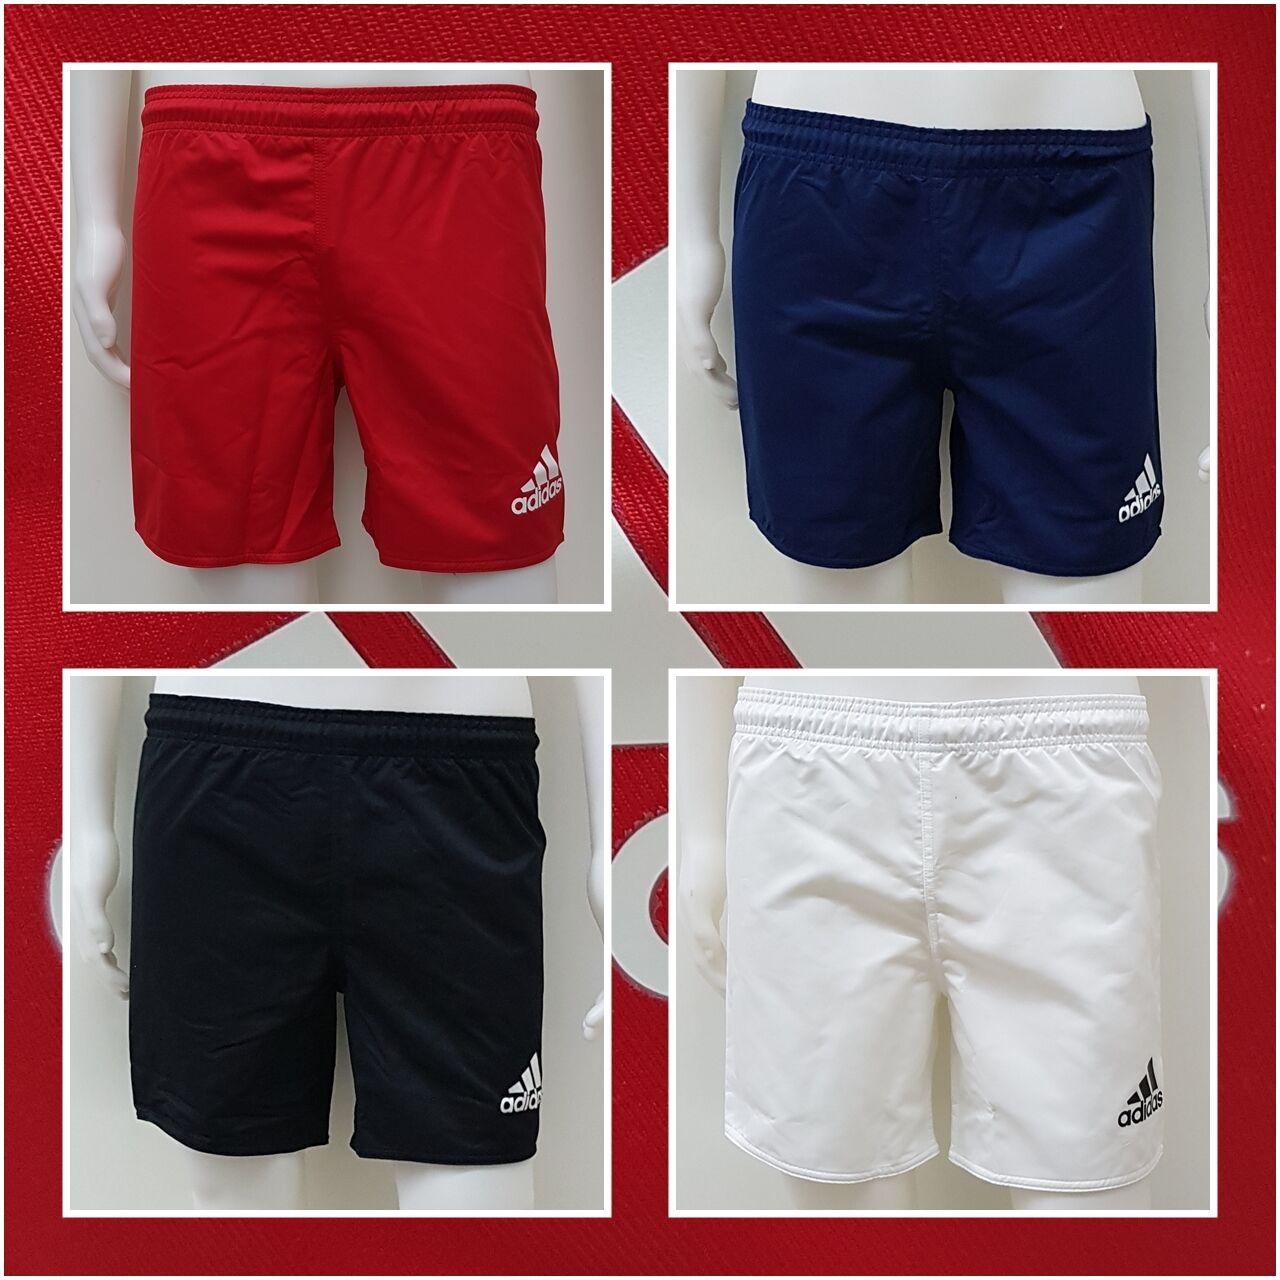 Jetzt Bestellen Adidas Rot Kurze Hose & Hose, Herren Adidas